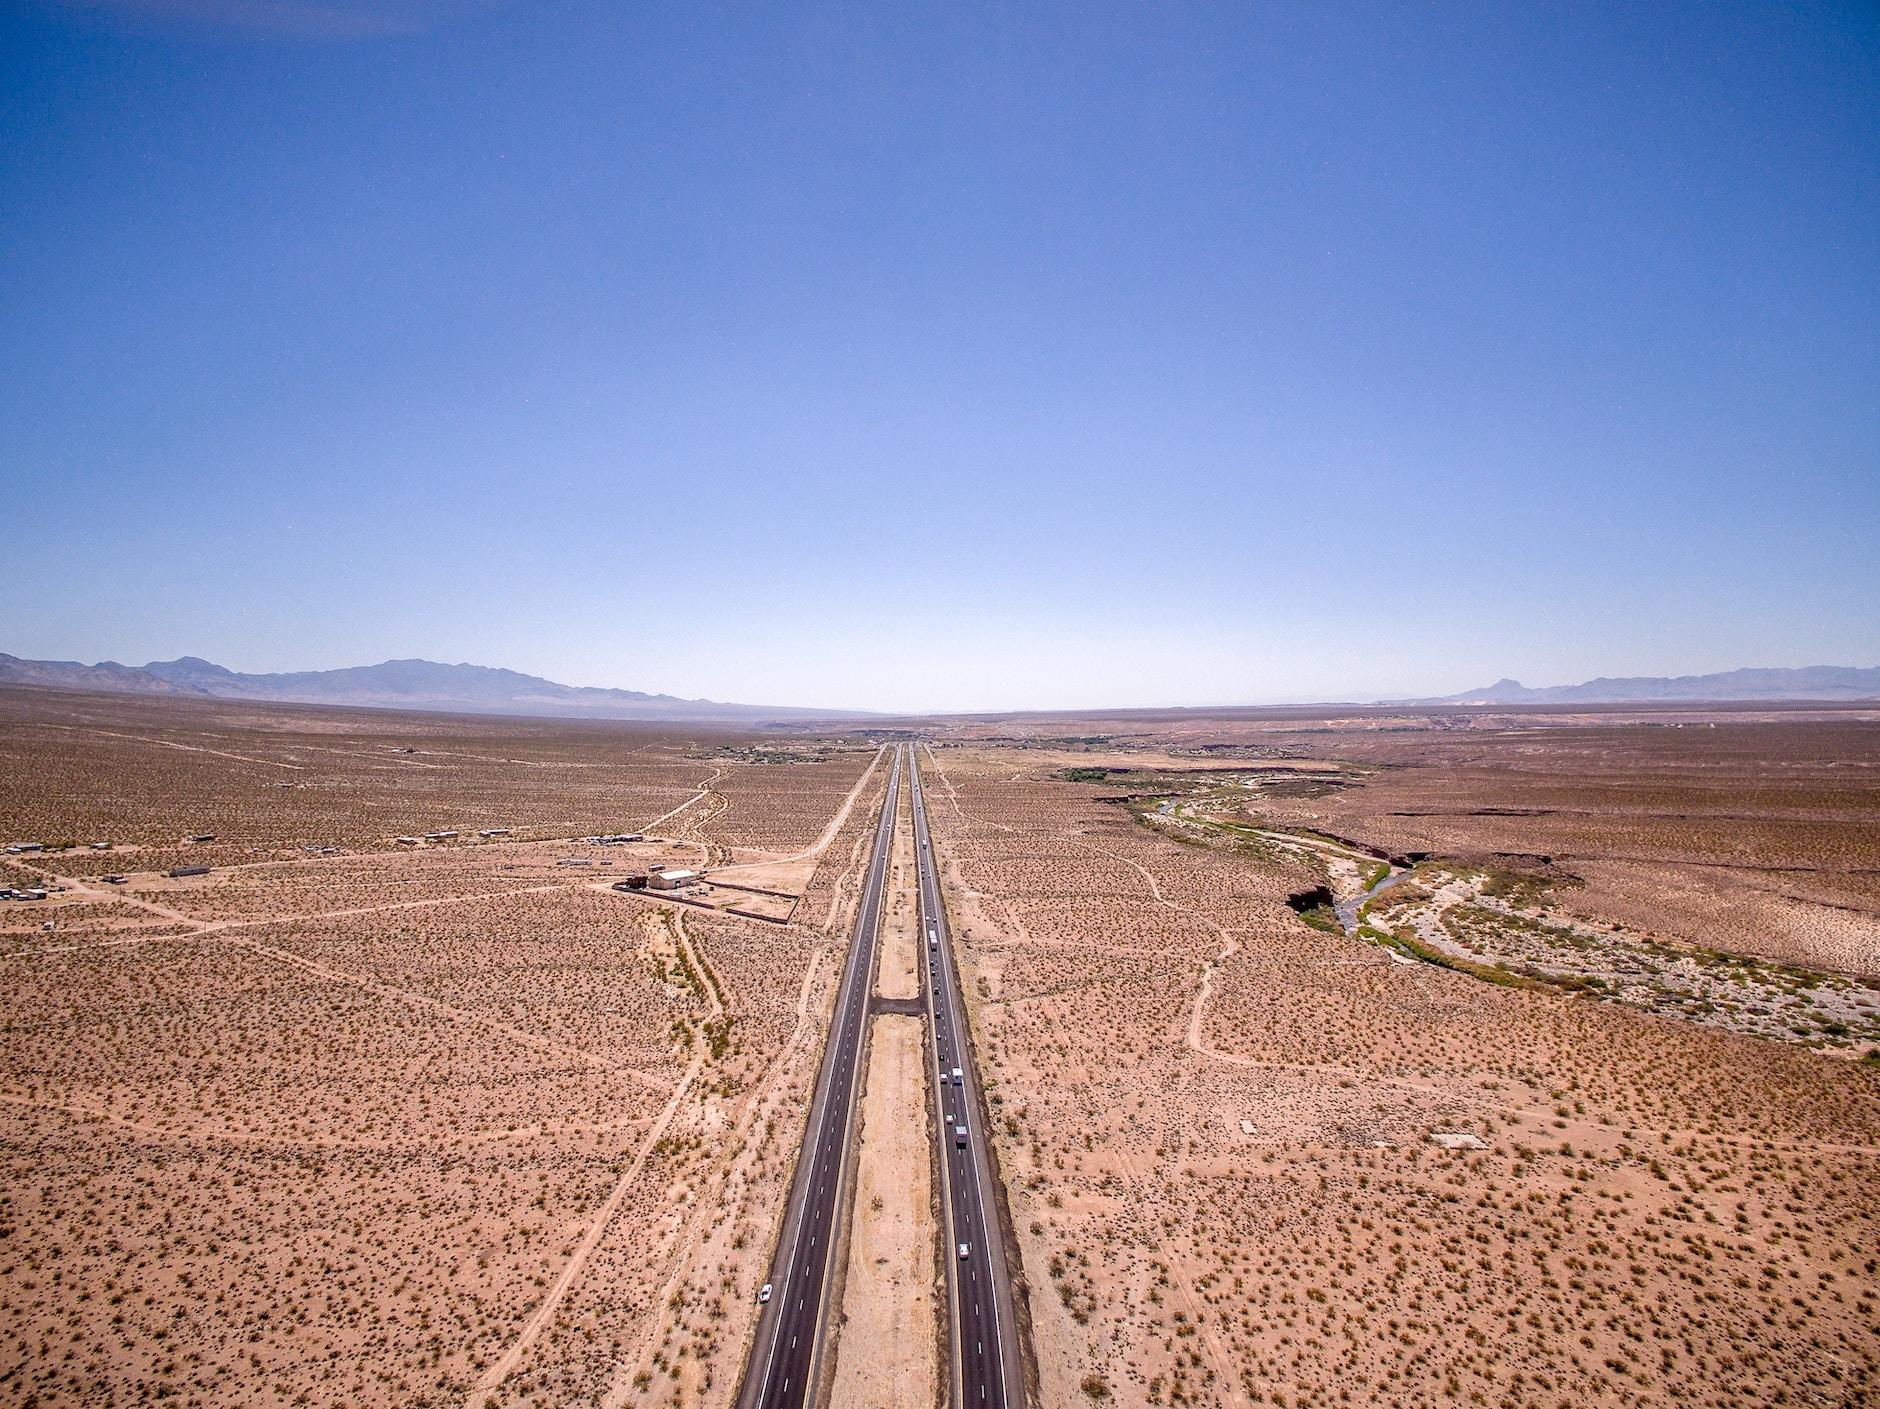 aerial of desert in arizona